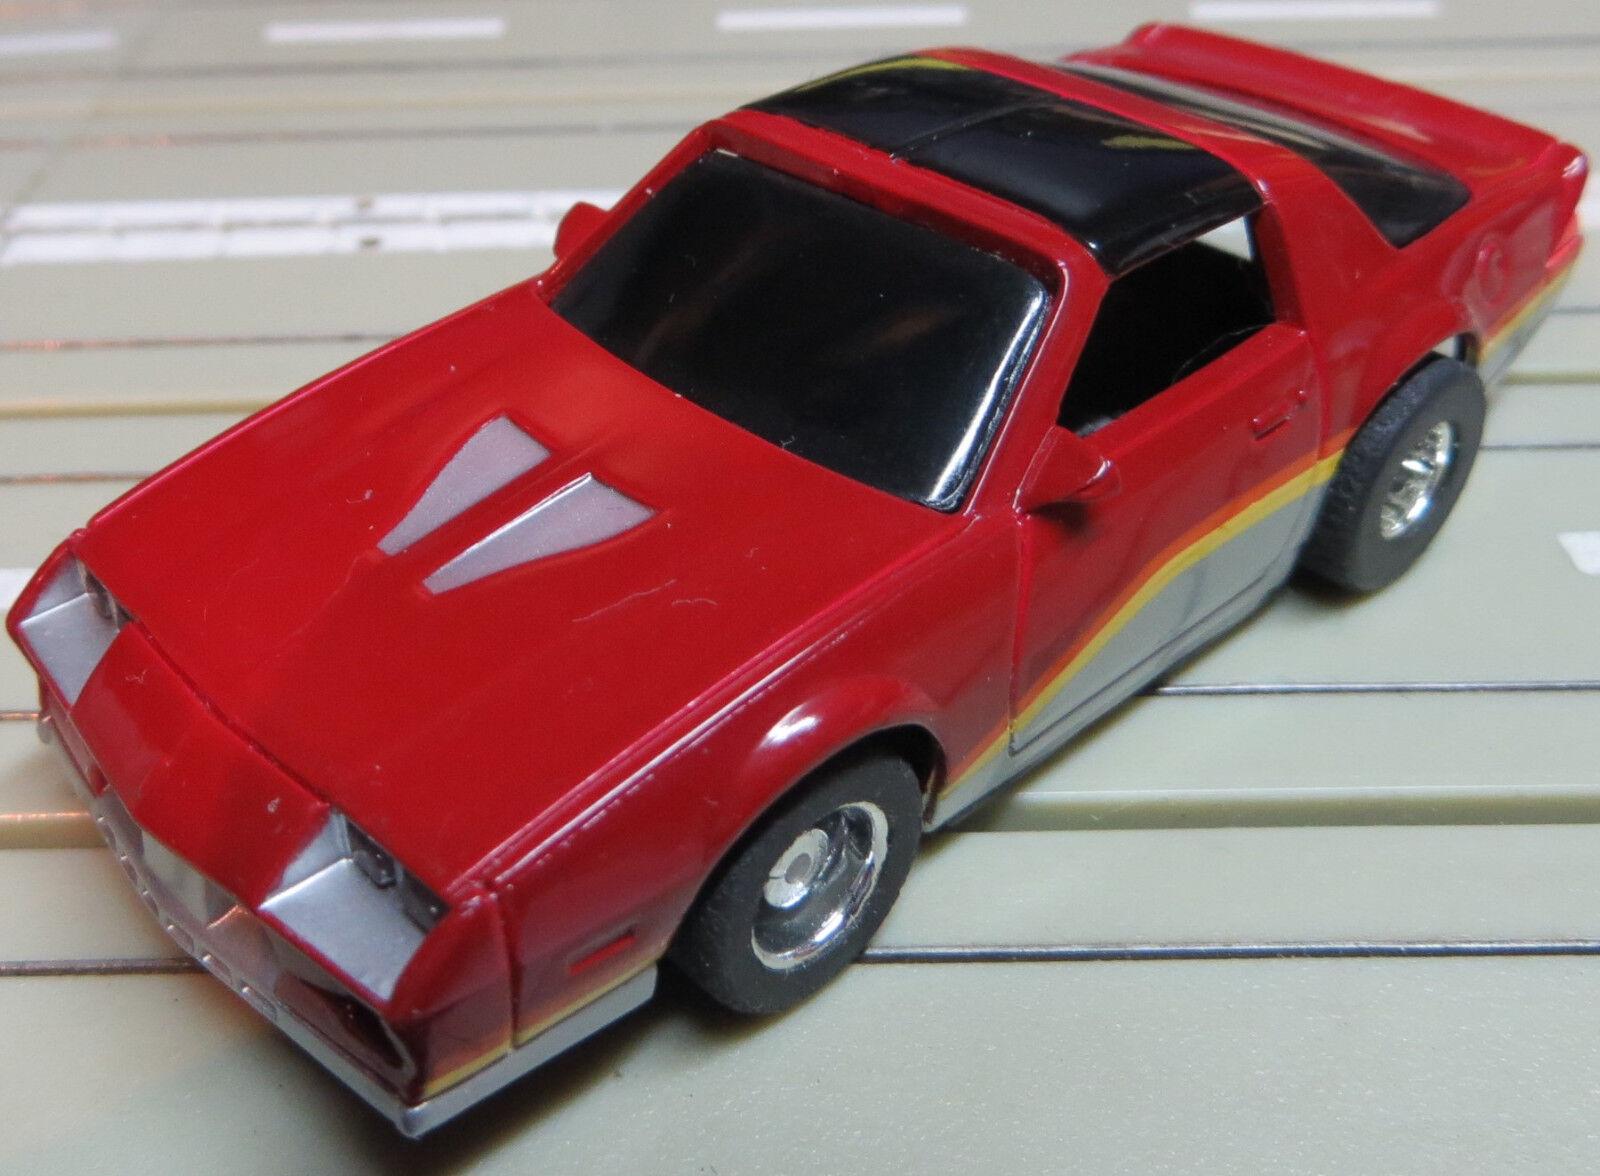 Für H0 Slotcar Racing Modellbahn  --  Pontiac Firebird Firebird Firebird  mit Tyco Chassis  | Stil  8a9617